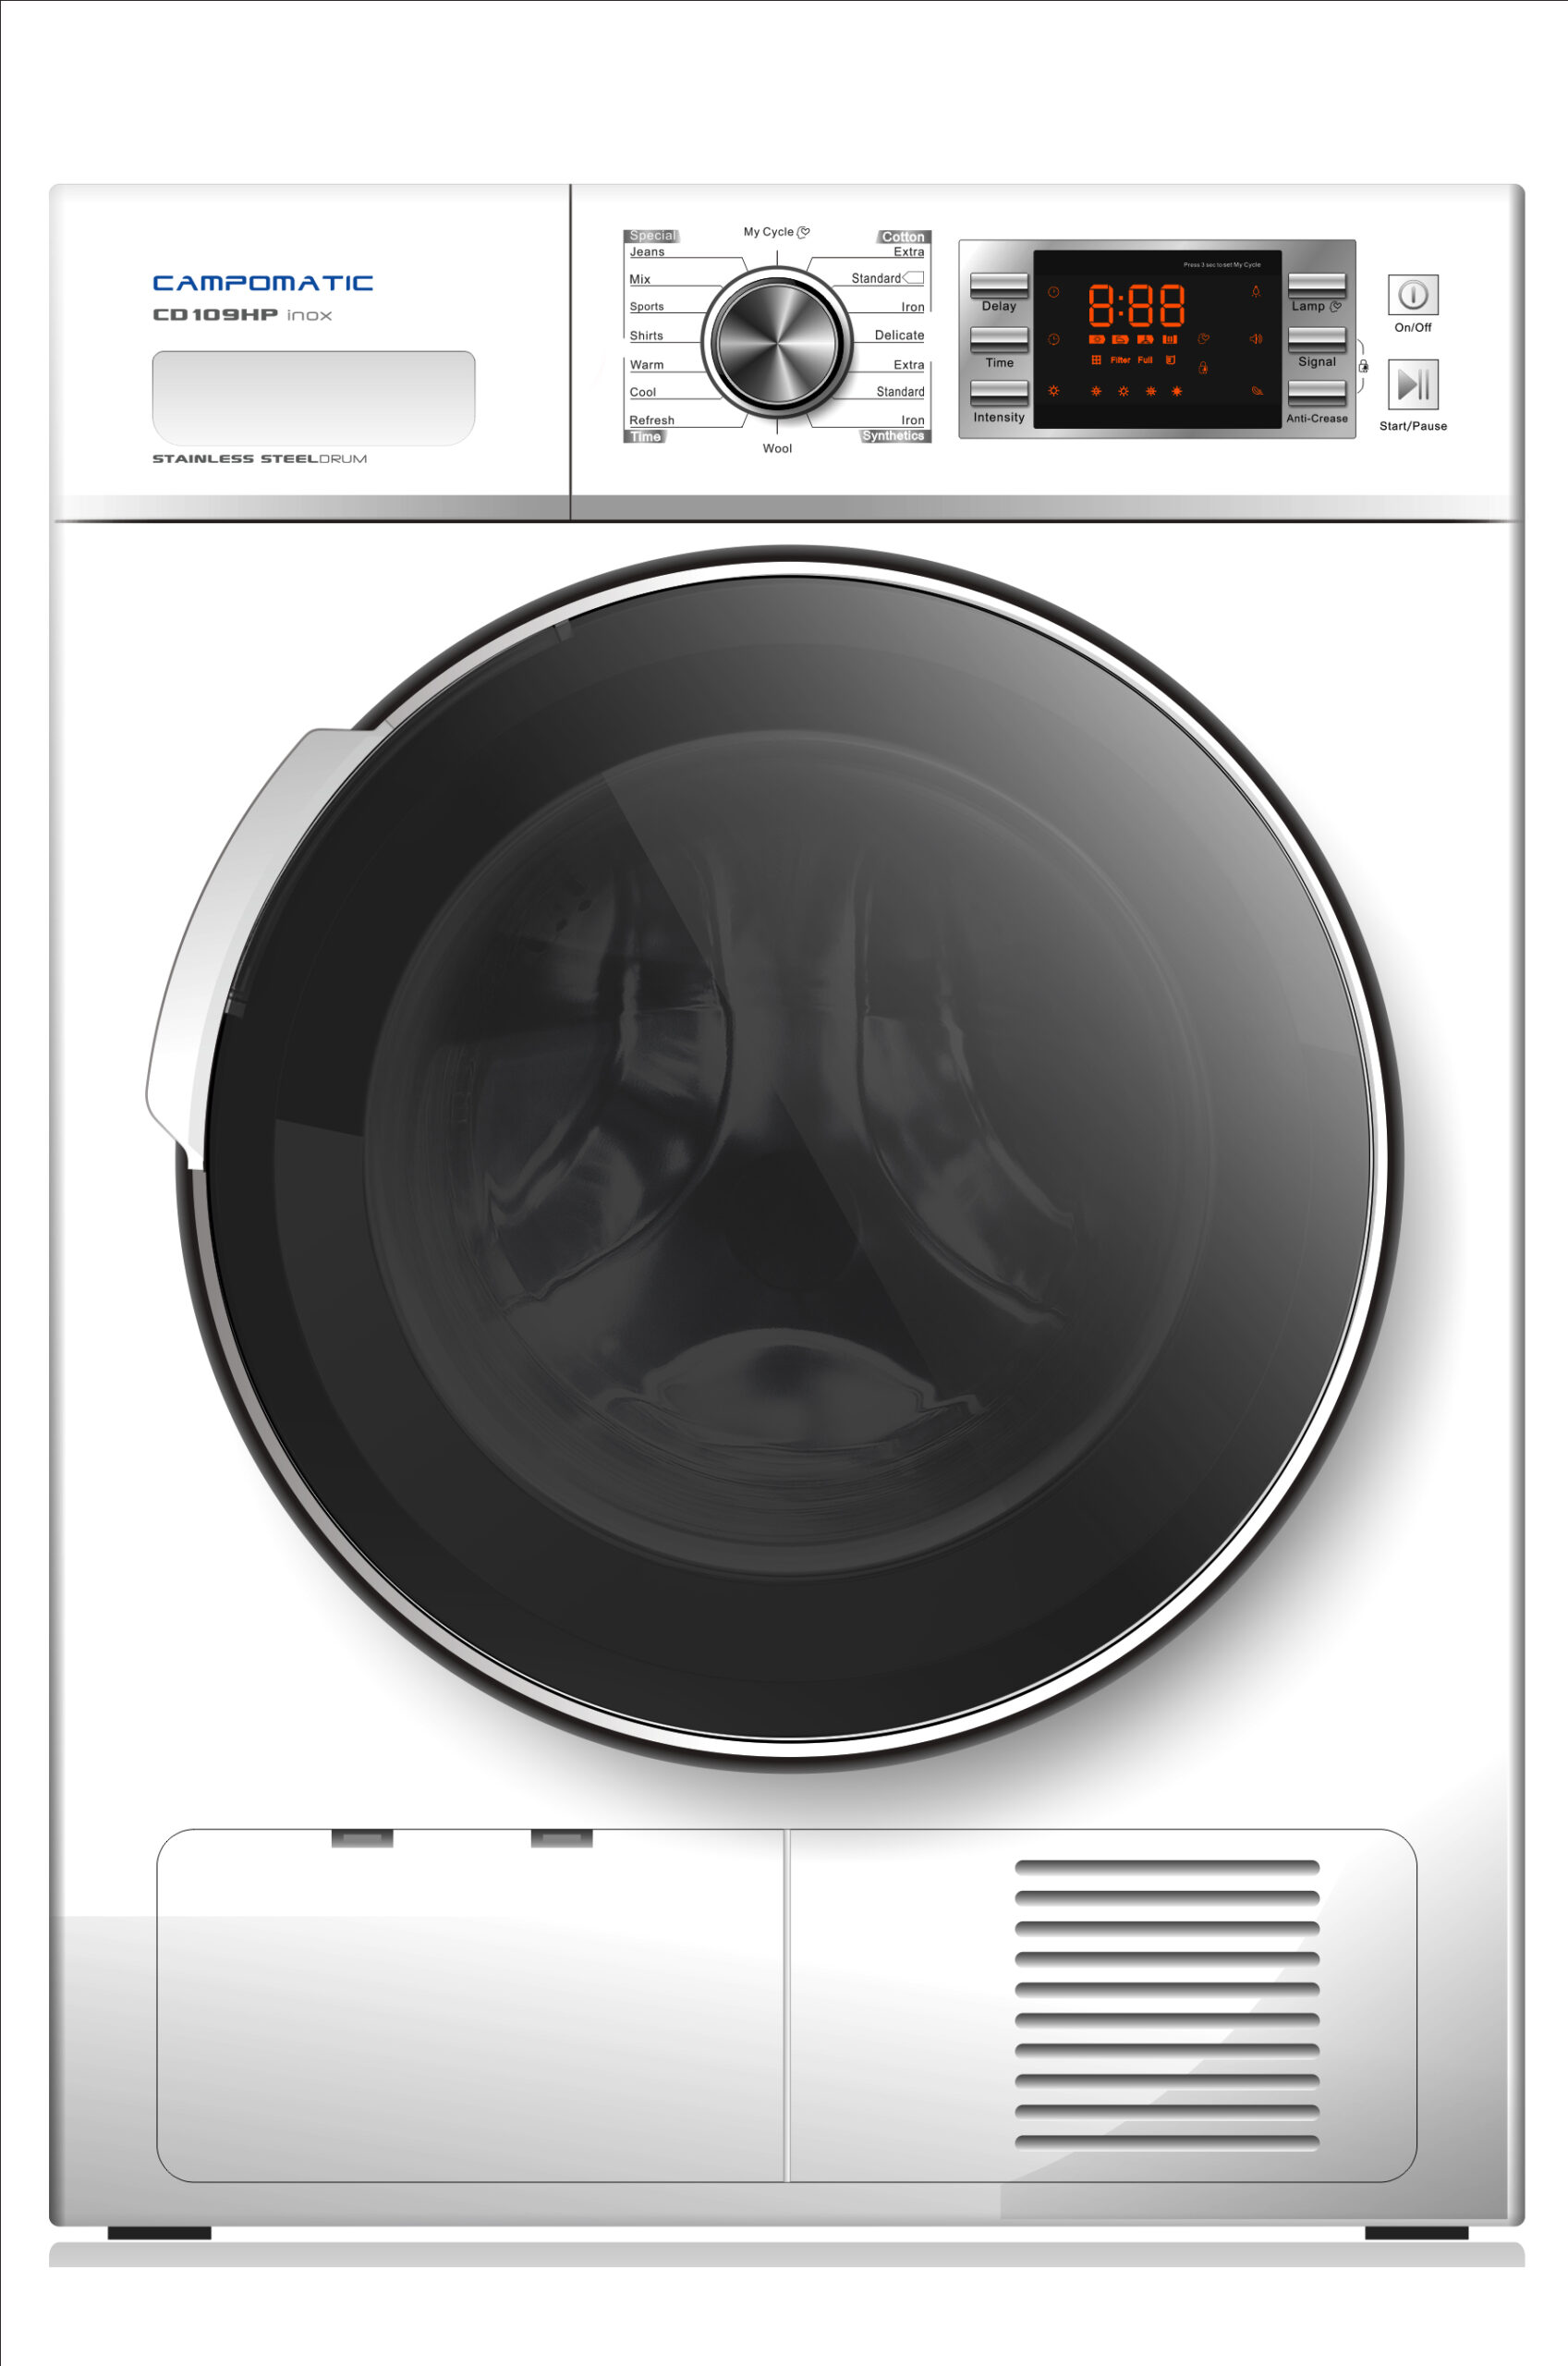 Campomatic Heat Pump Condenser Dryer 10KG White CD109HPS